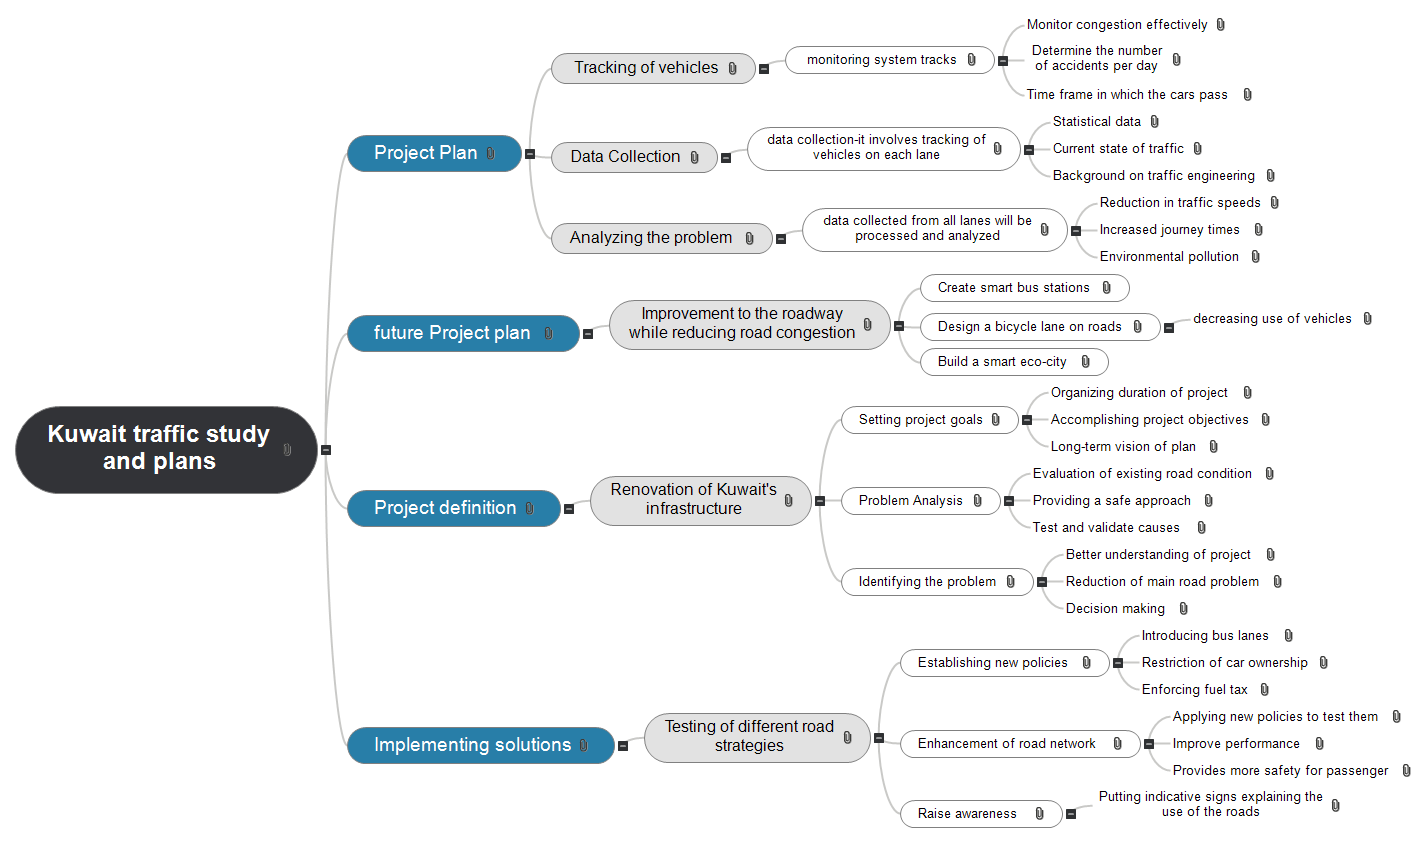 Kuwait traffic study and plans point 9 aisha (1) Mind Map